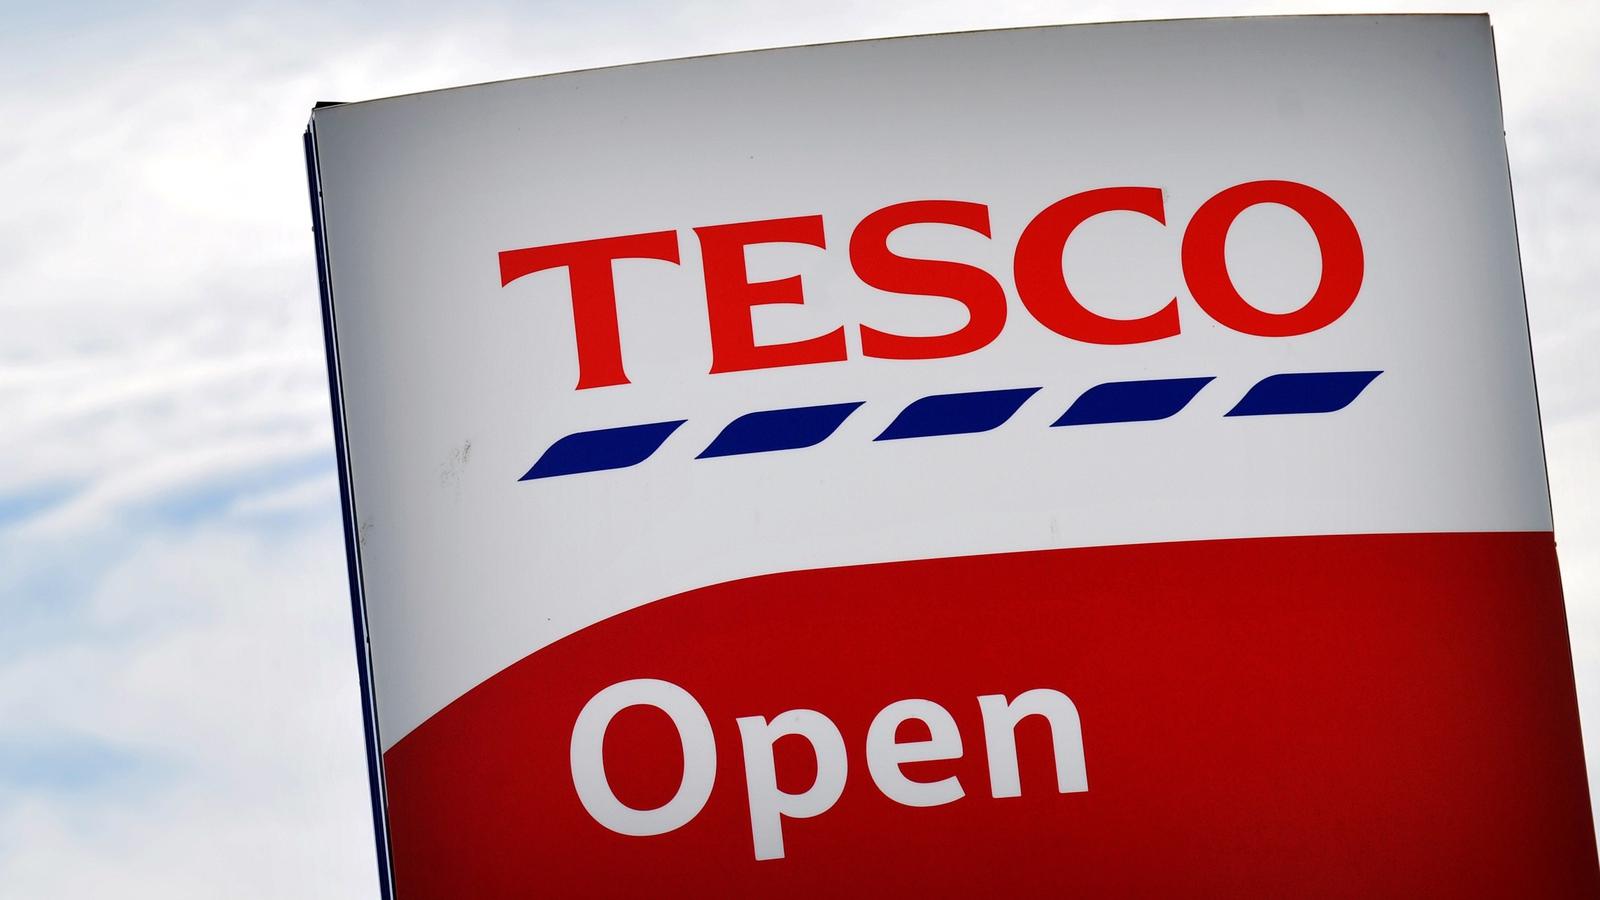 Tesco Says Coronavirus Costs Could Reach 925m